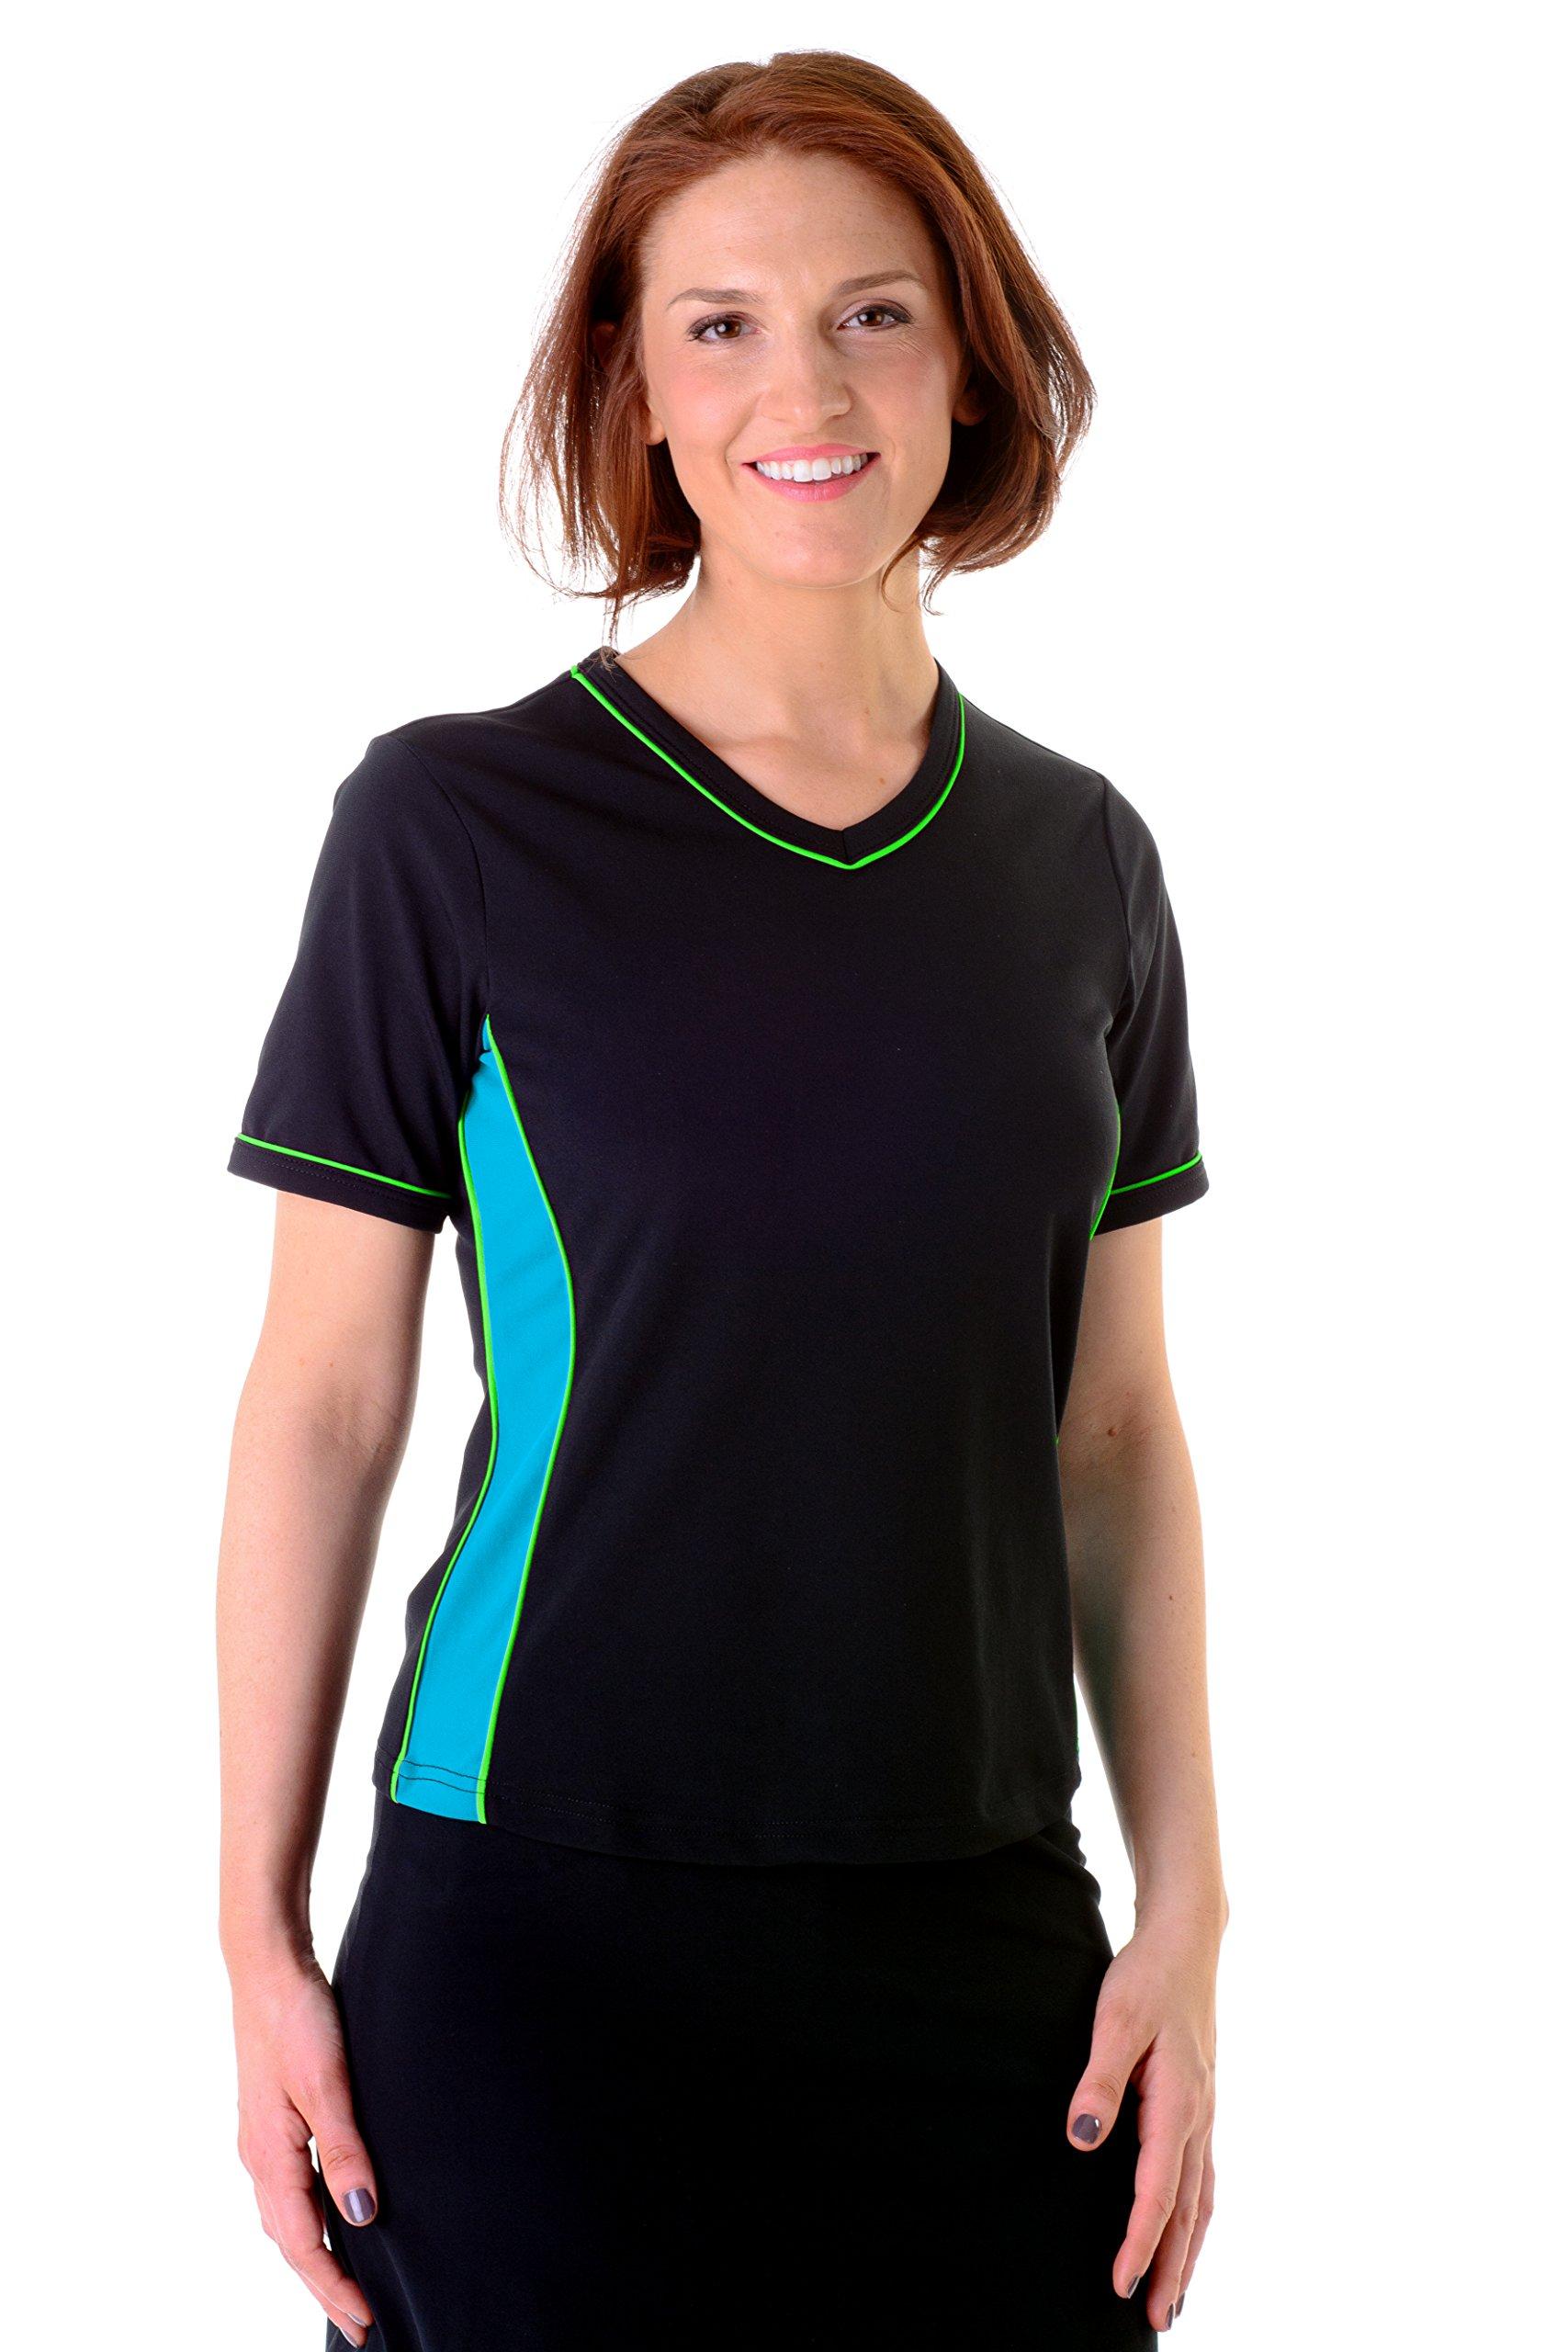 HydroChic Women's Plus Size V-Neck Swim Shirt – Chlorine Proof Rash Guard - Black/Sea Blue/Lime Green, 2X by HydroChic (Image #1)